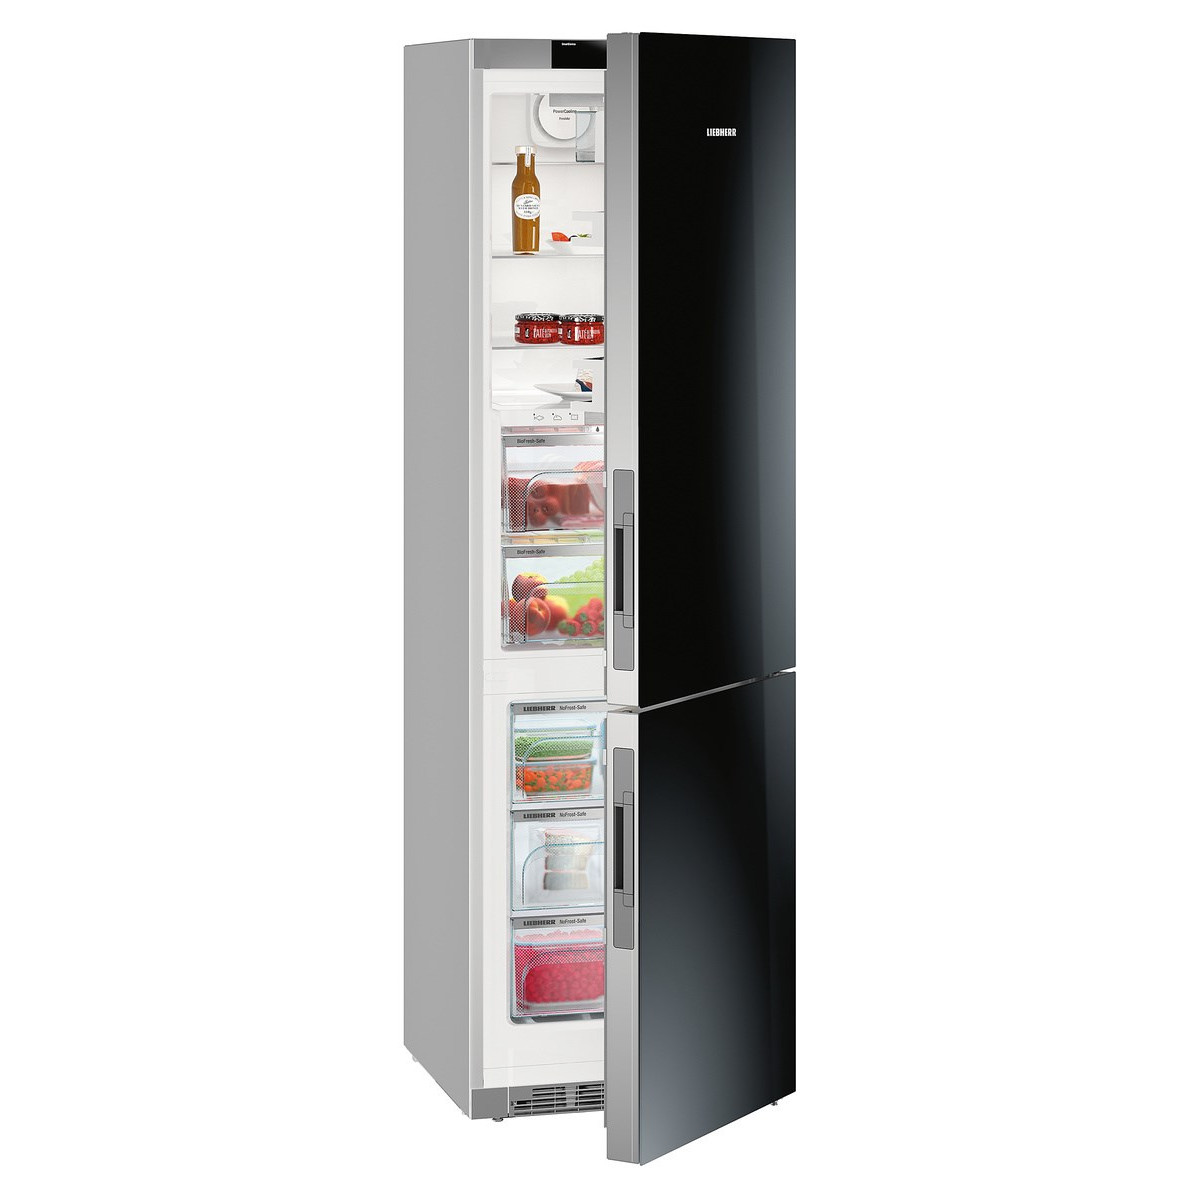 liebherr cbnpgb 4855 premium biofresh nofrost fridge. Black Bedroom Furniture Sets. Home Design Ideas